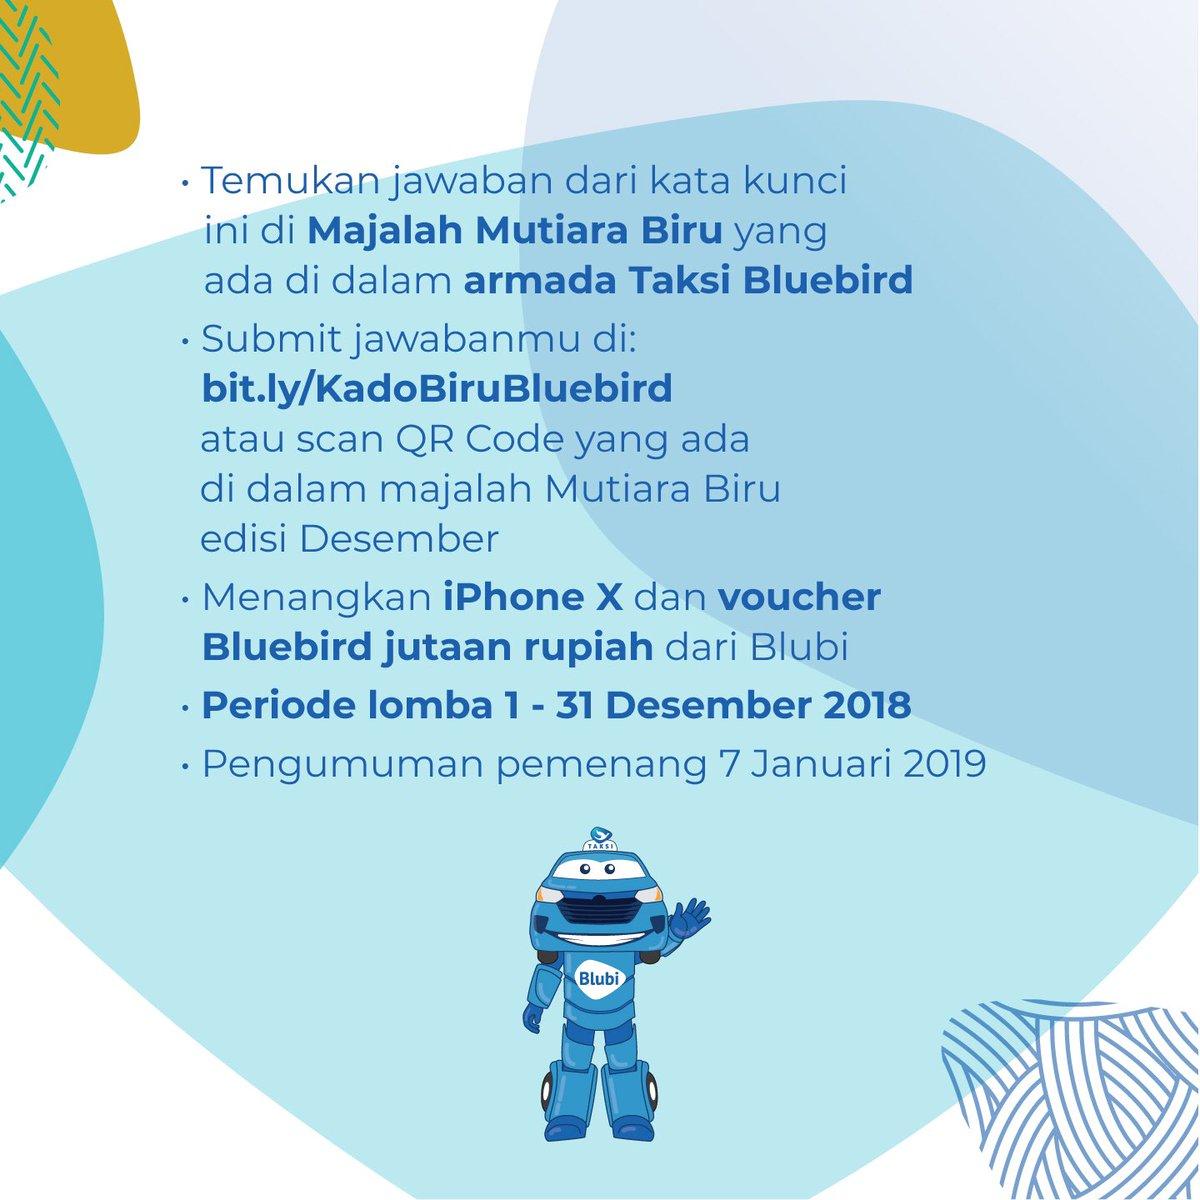 #BlueBird - Promo Kado Biru Tahun Baru Dapatkan IPHONEX